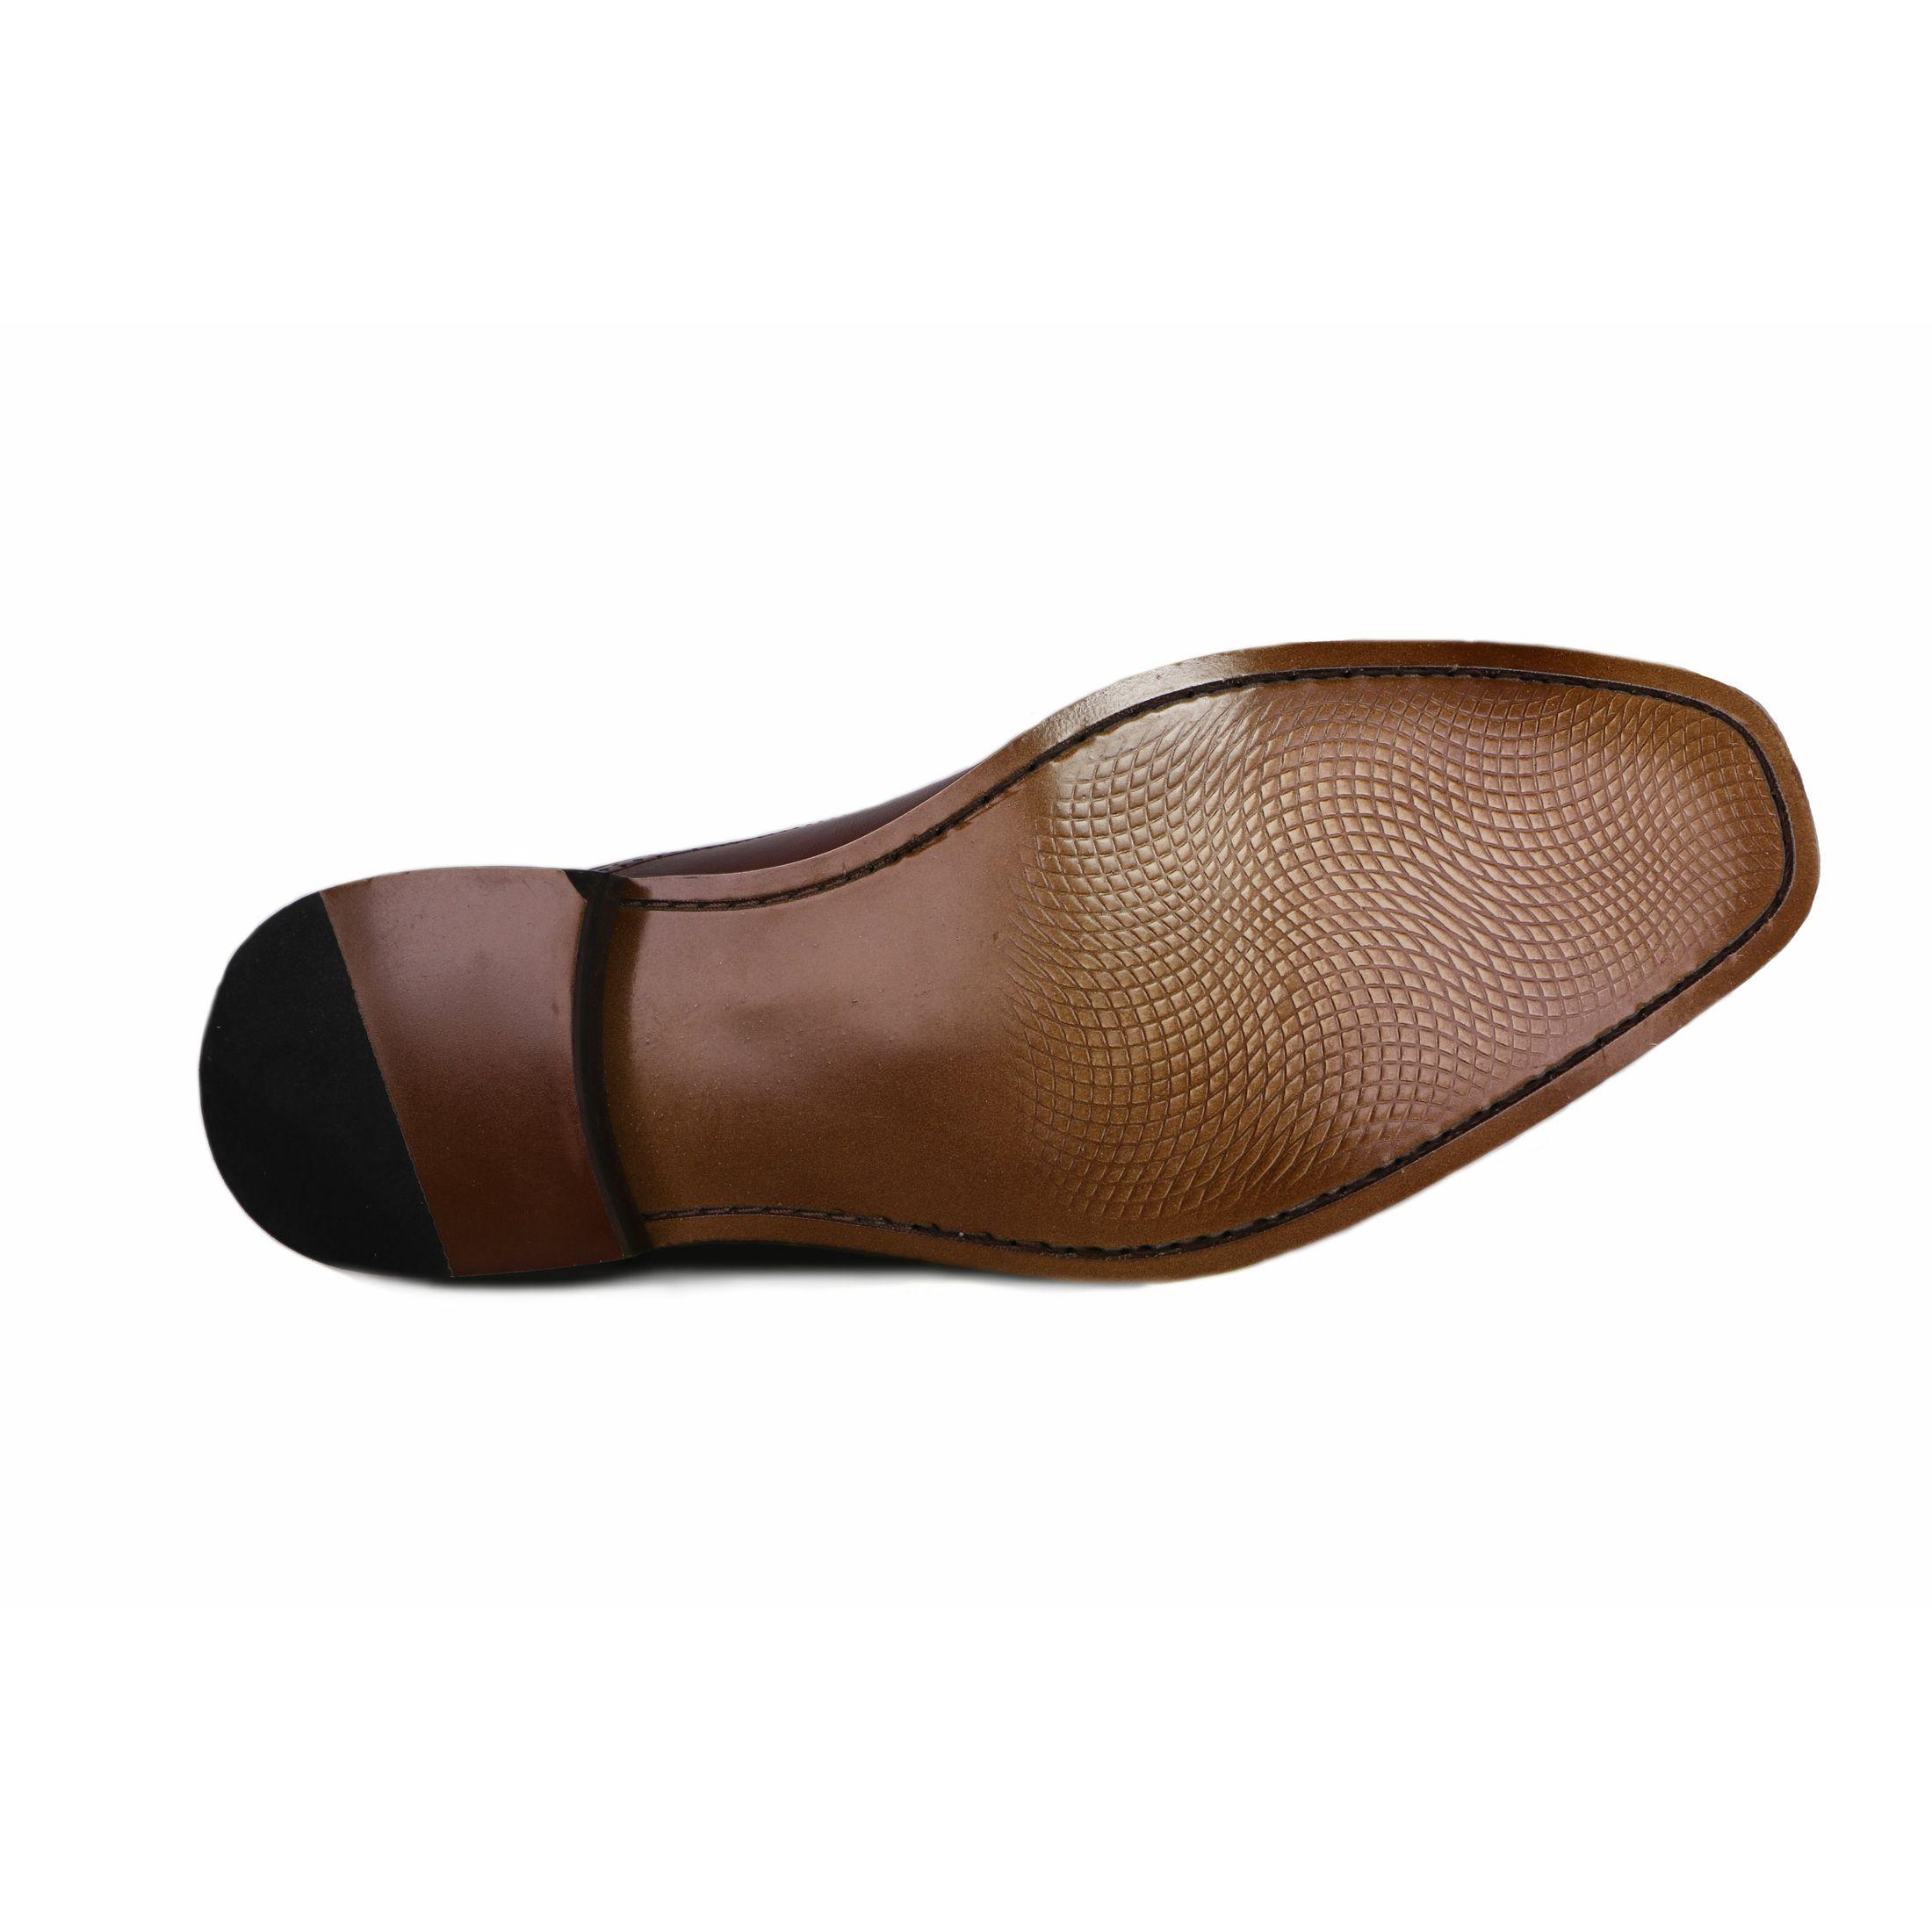 Zapato Formal Elegant Café Max Denegri +7cm de Altura_70802